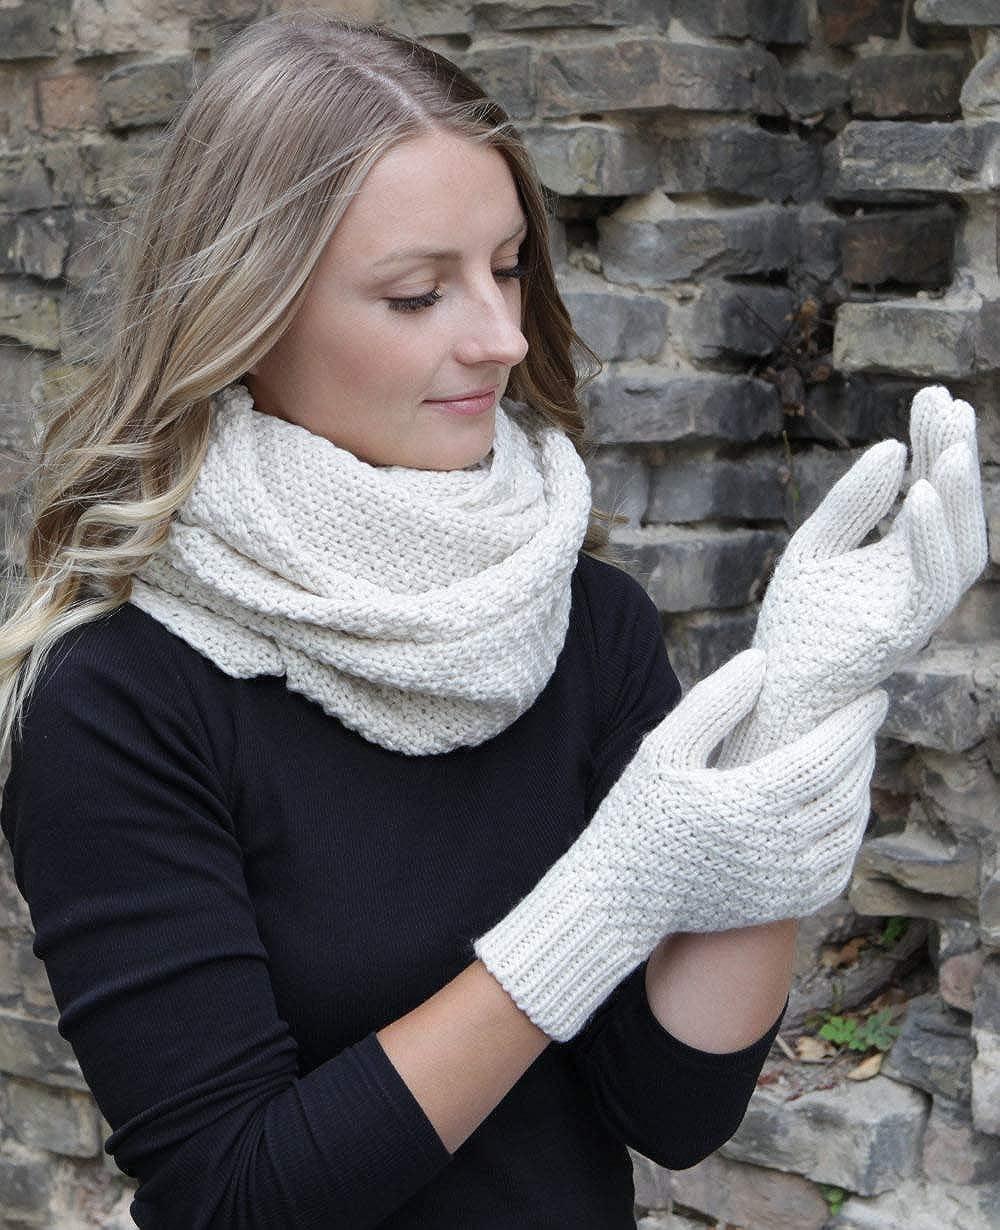 284b4eb4ef62cd 2-tlg Hilltop Winter Kombi Set aus Schal und wahlweise Handschuhe oder  Handwärmer versch Farben